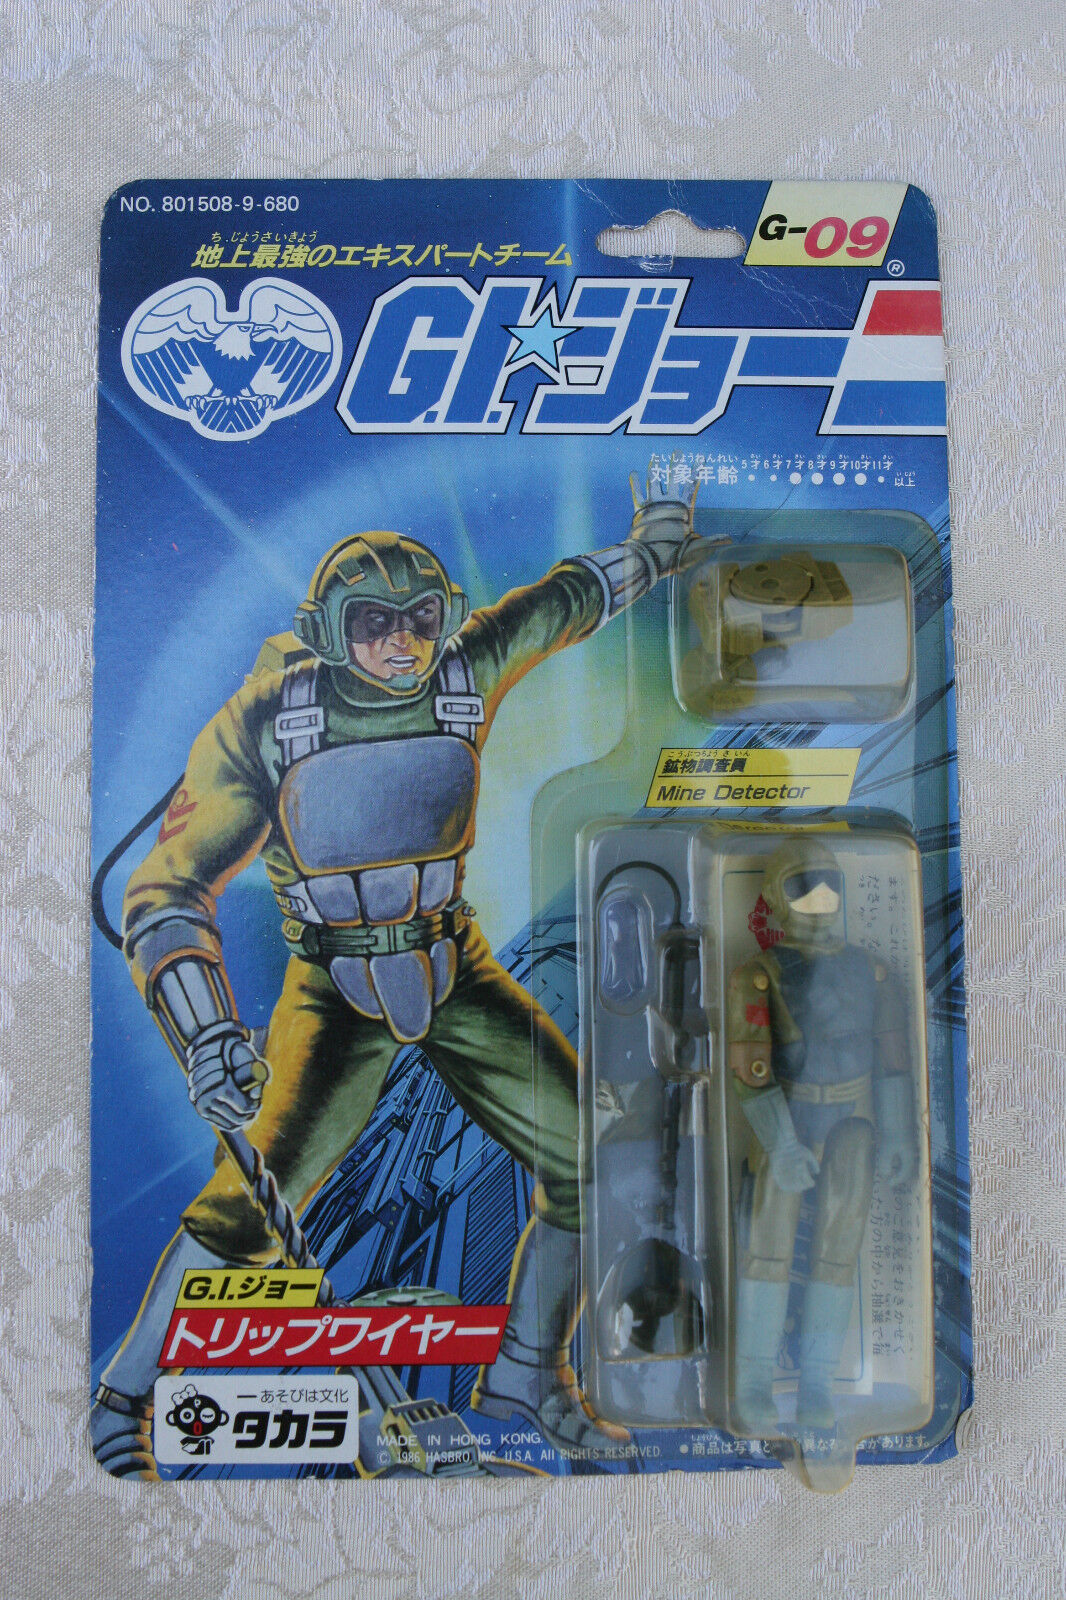 1986 Takara GI Joe Mine Detector Trip Wire MOC In Star Case